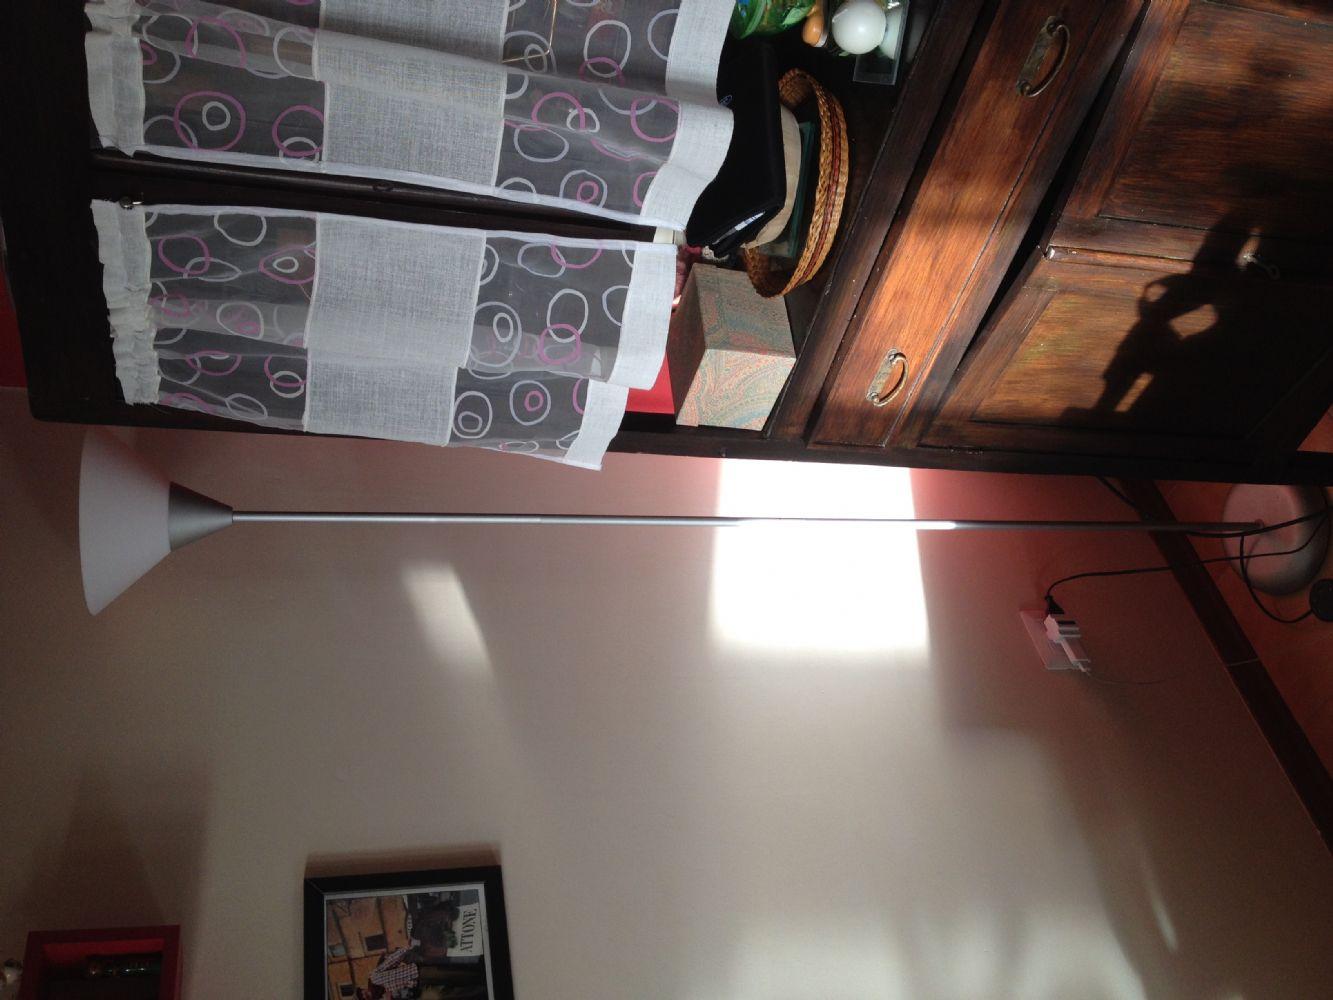 Lampade Da Terra Ikea: Lampade a led per arredare - fotogallery ...